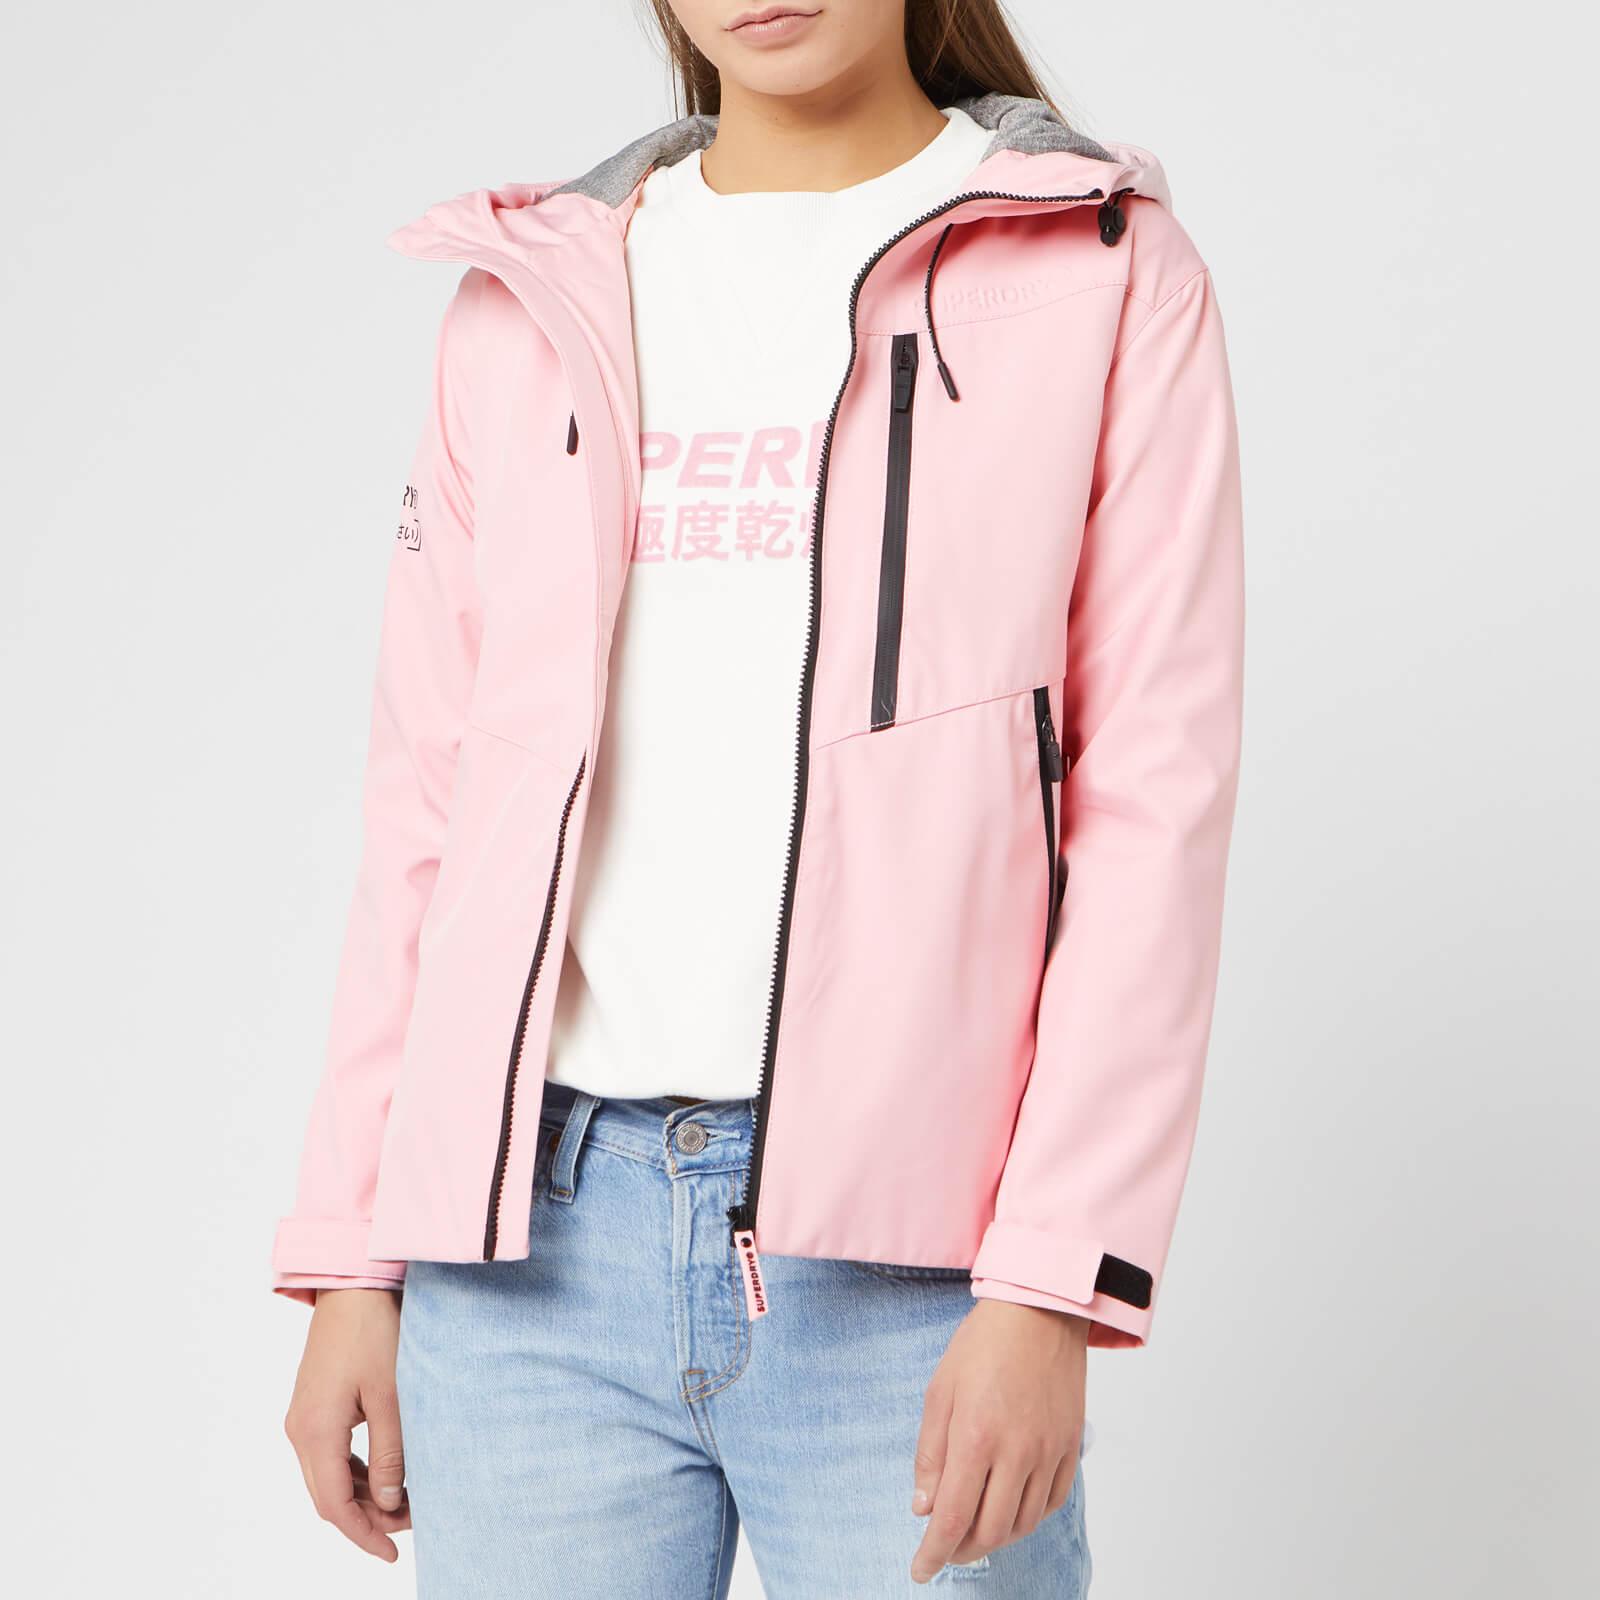 Superdry Women's Eclipse SD-Windcheater Jacket - Powder Pink - UK 12 - Pink